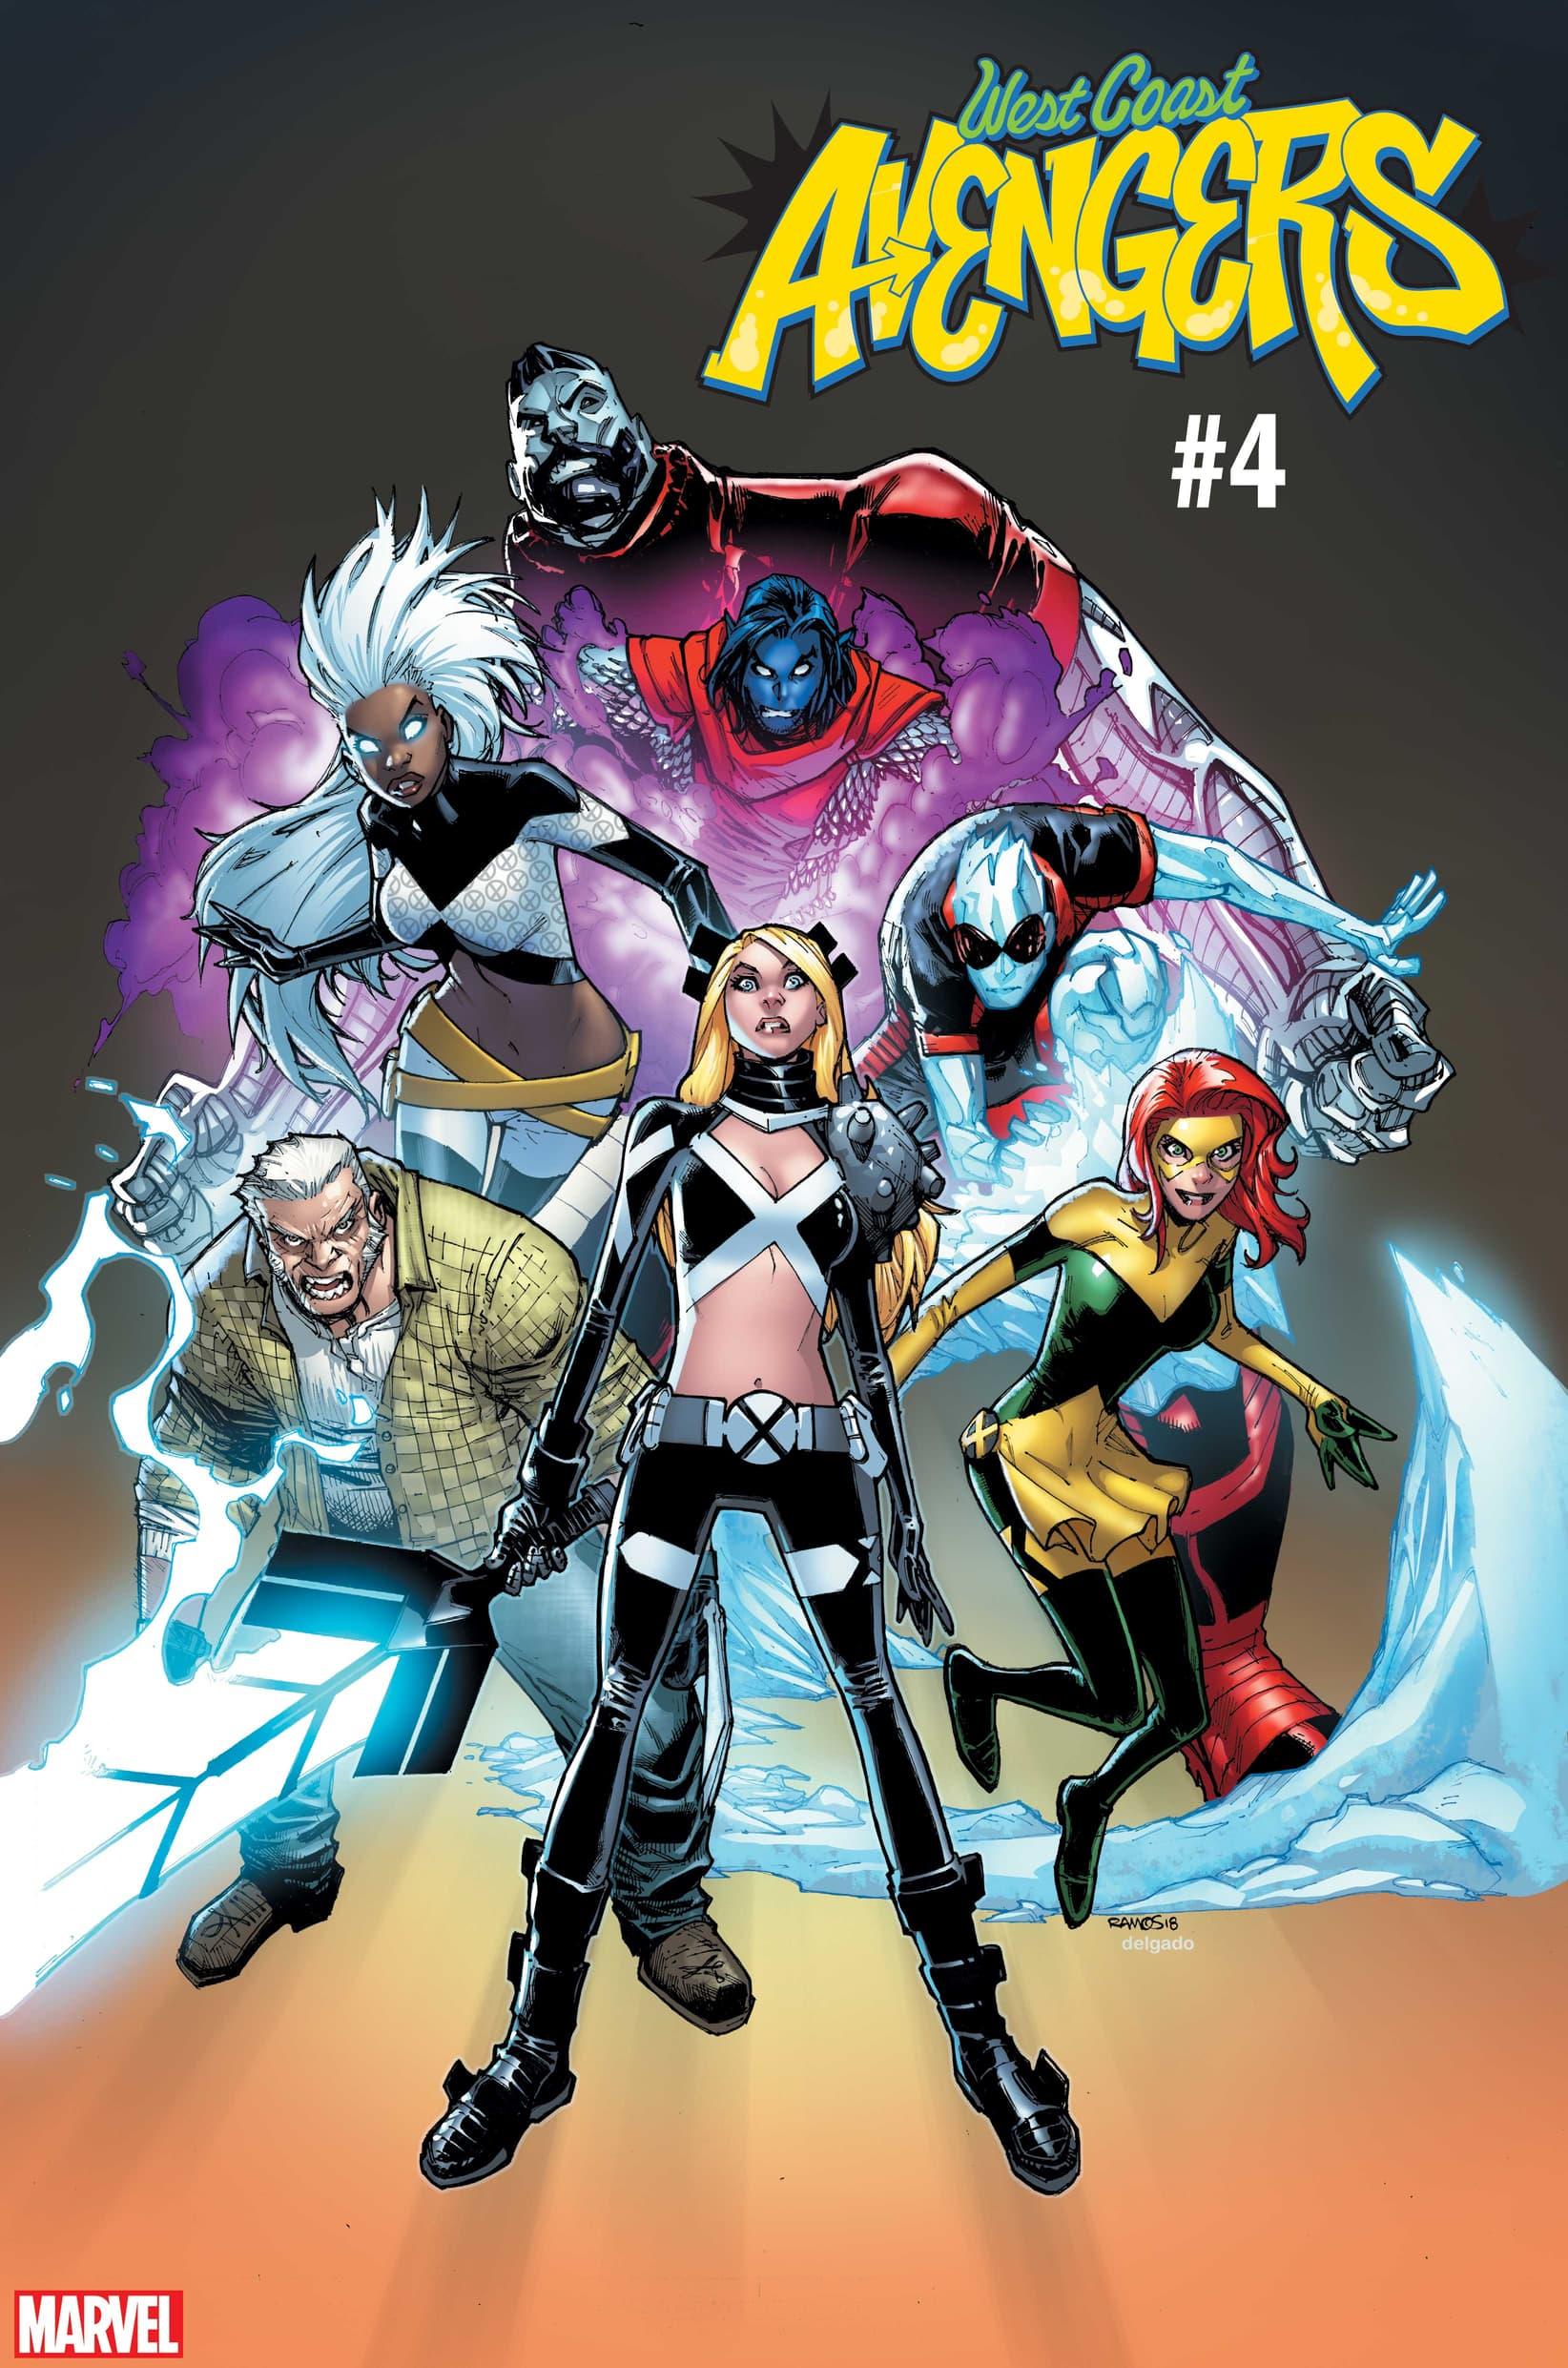 WEST COAST AVENGERS #4 / UNCANNY X-MEN VARIANT COVER by Humberto Ramos